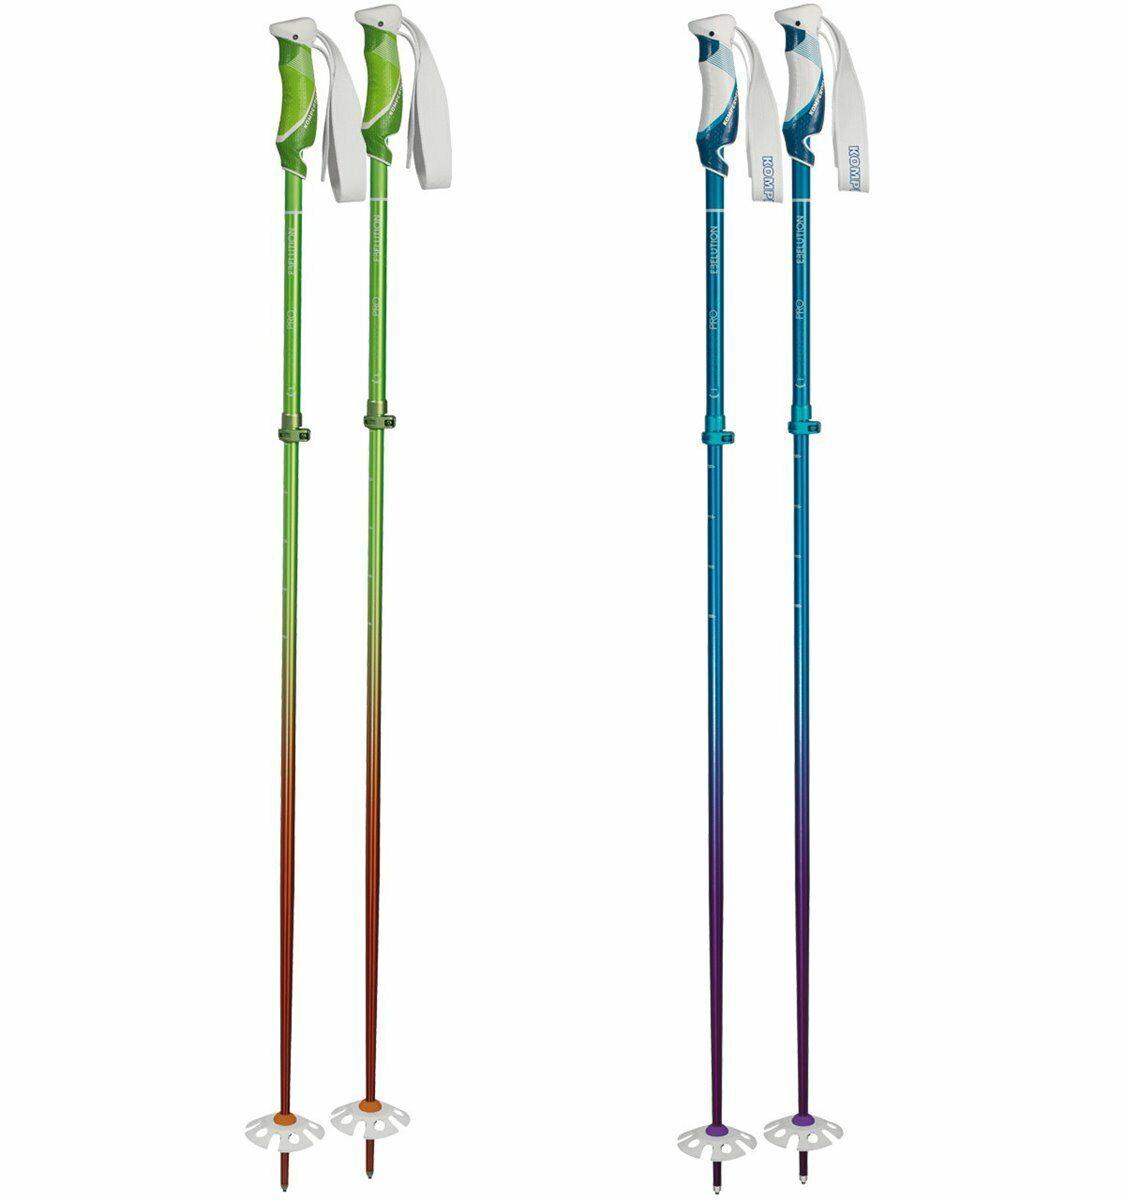 Komperdell Powder Pro Vario Ski Poles Bâtons de Réglable 105-135